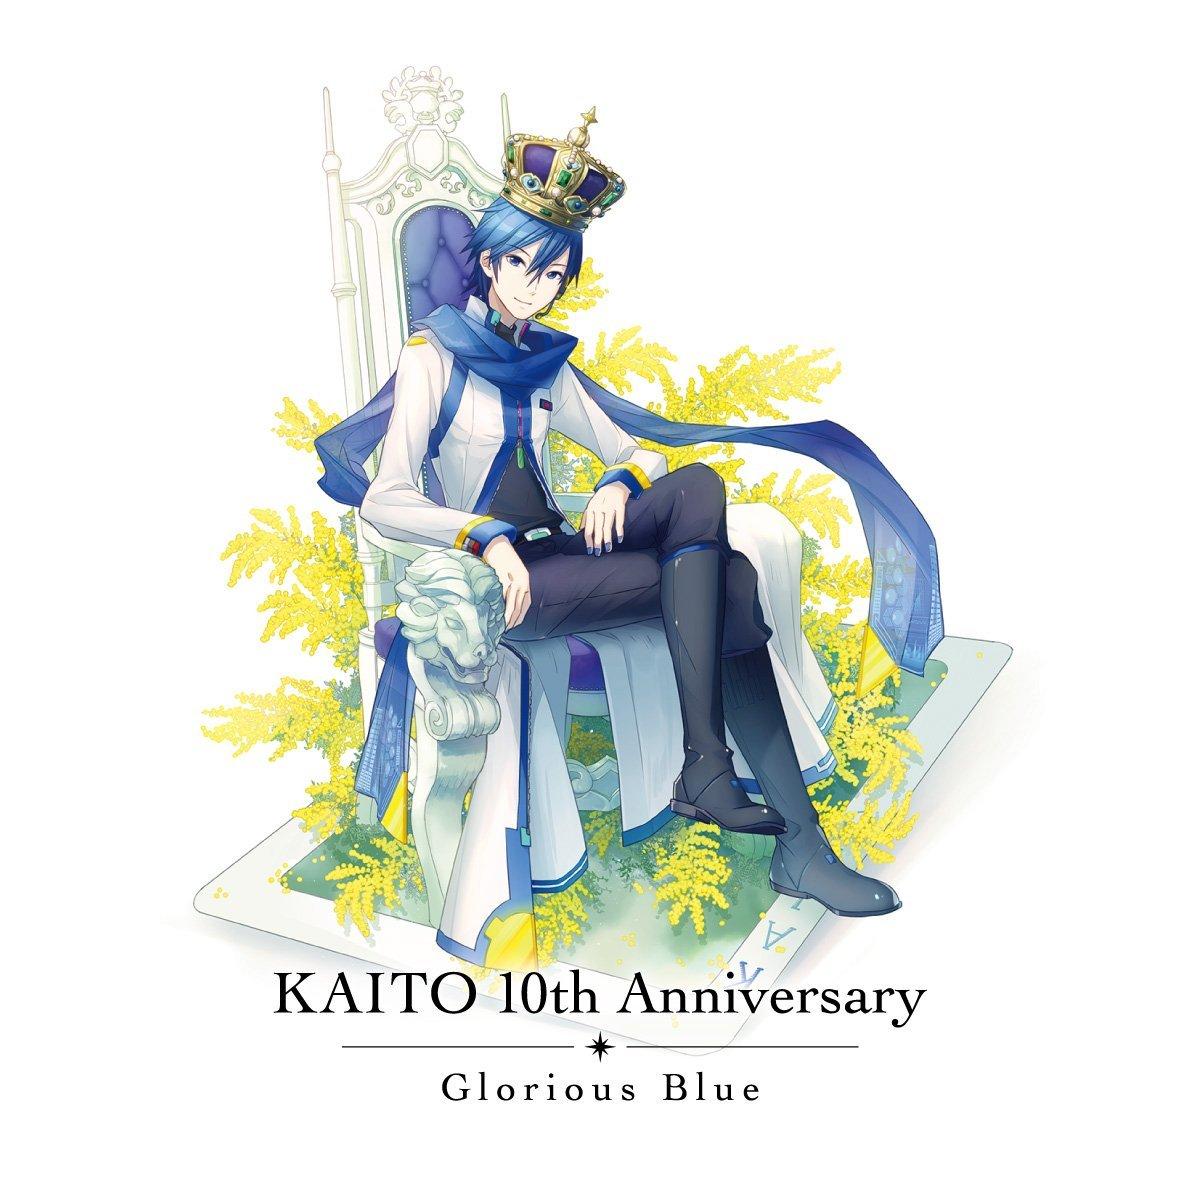 kaito 10th anniversary glorious blue vocaloid wiki